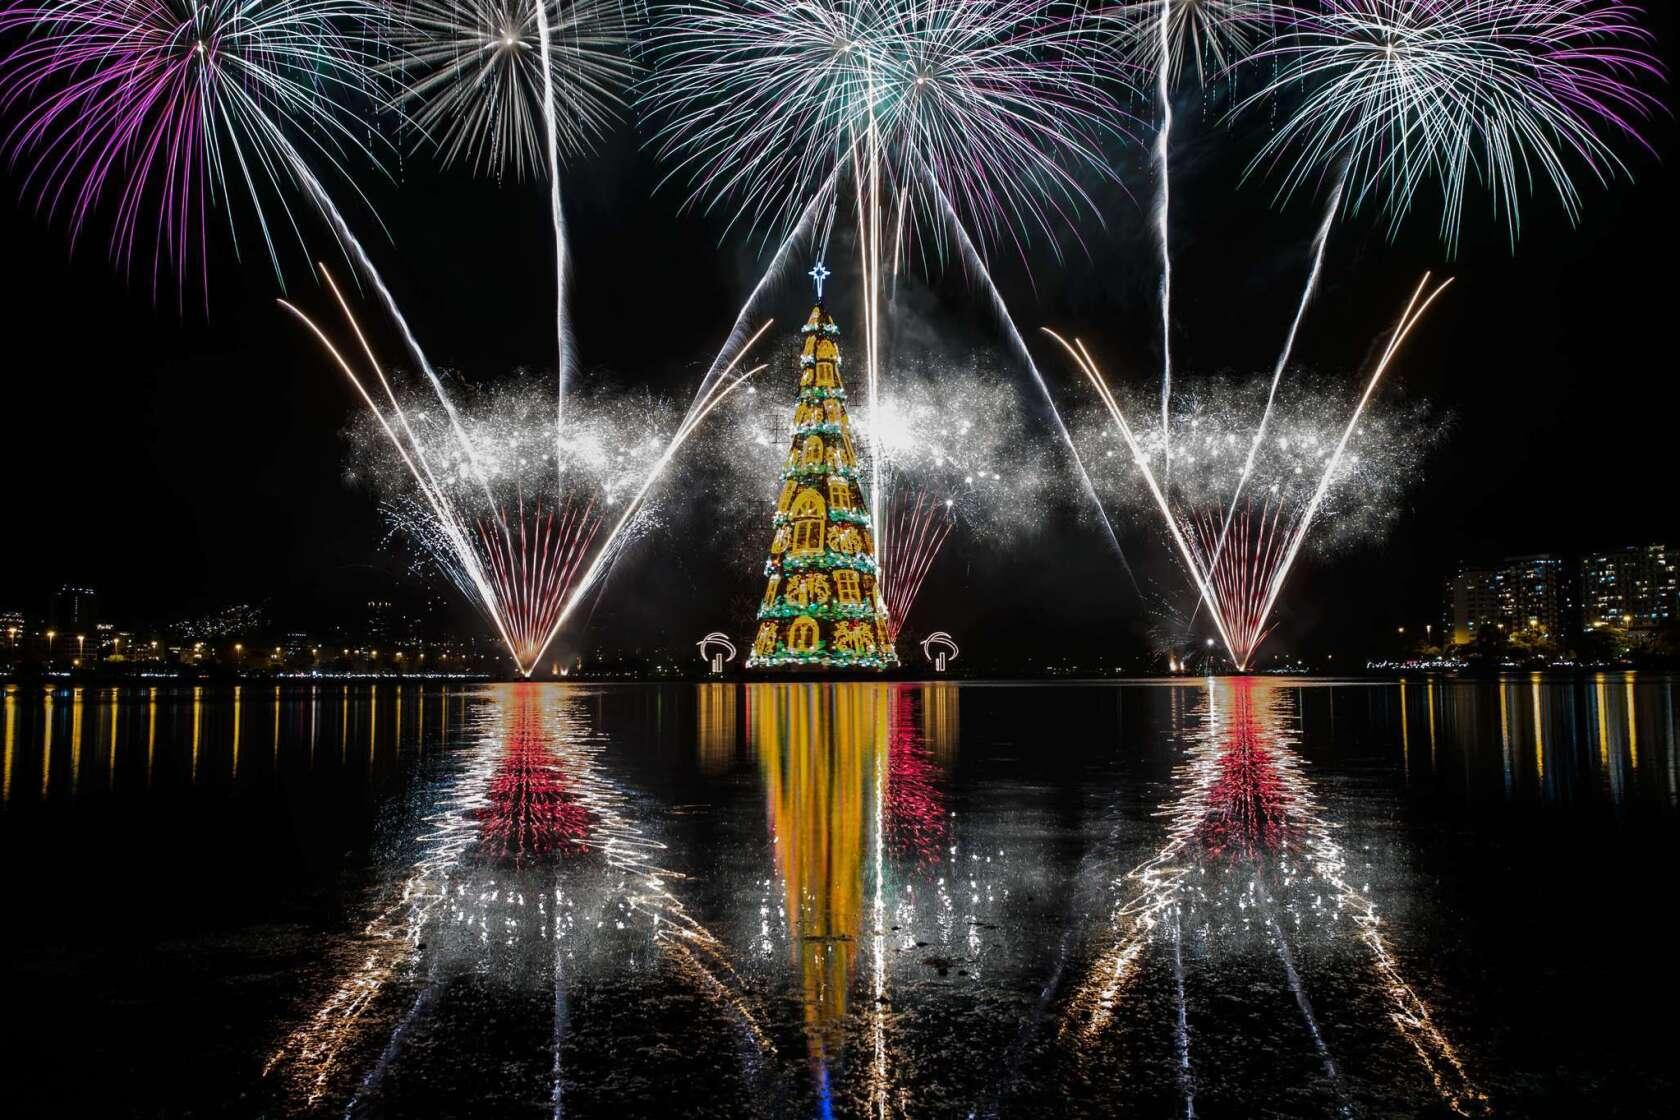 Brazil Christmas.Brazil 278 Foot Floating Christmas Tree Sails Into Rio S